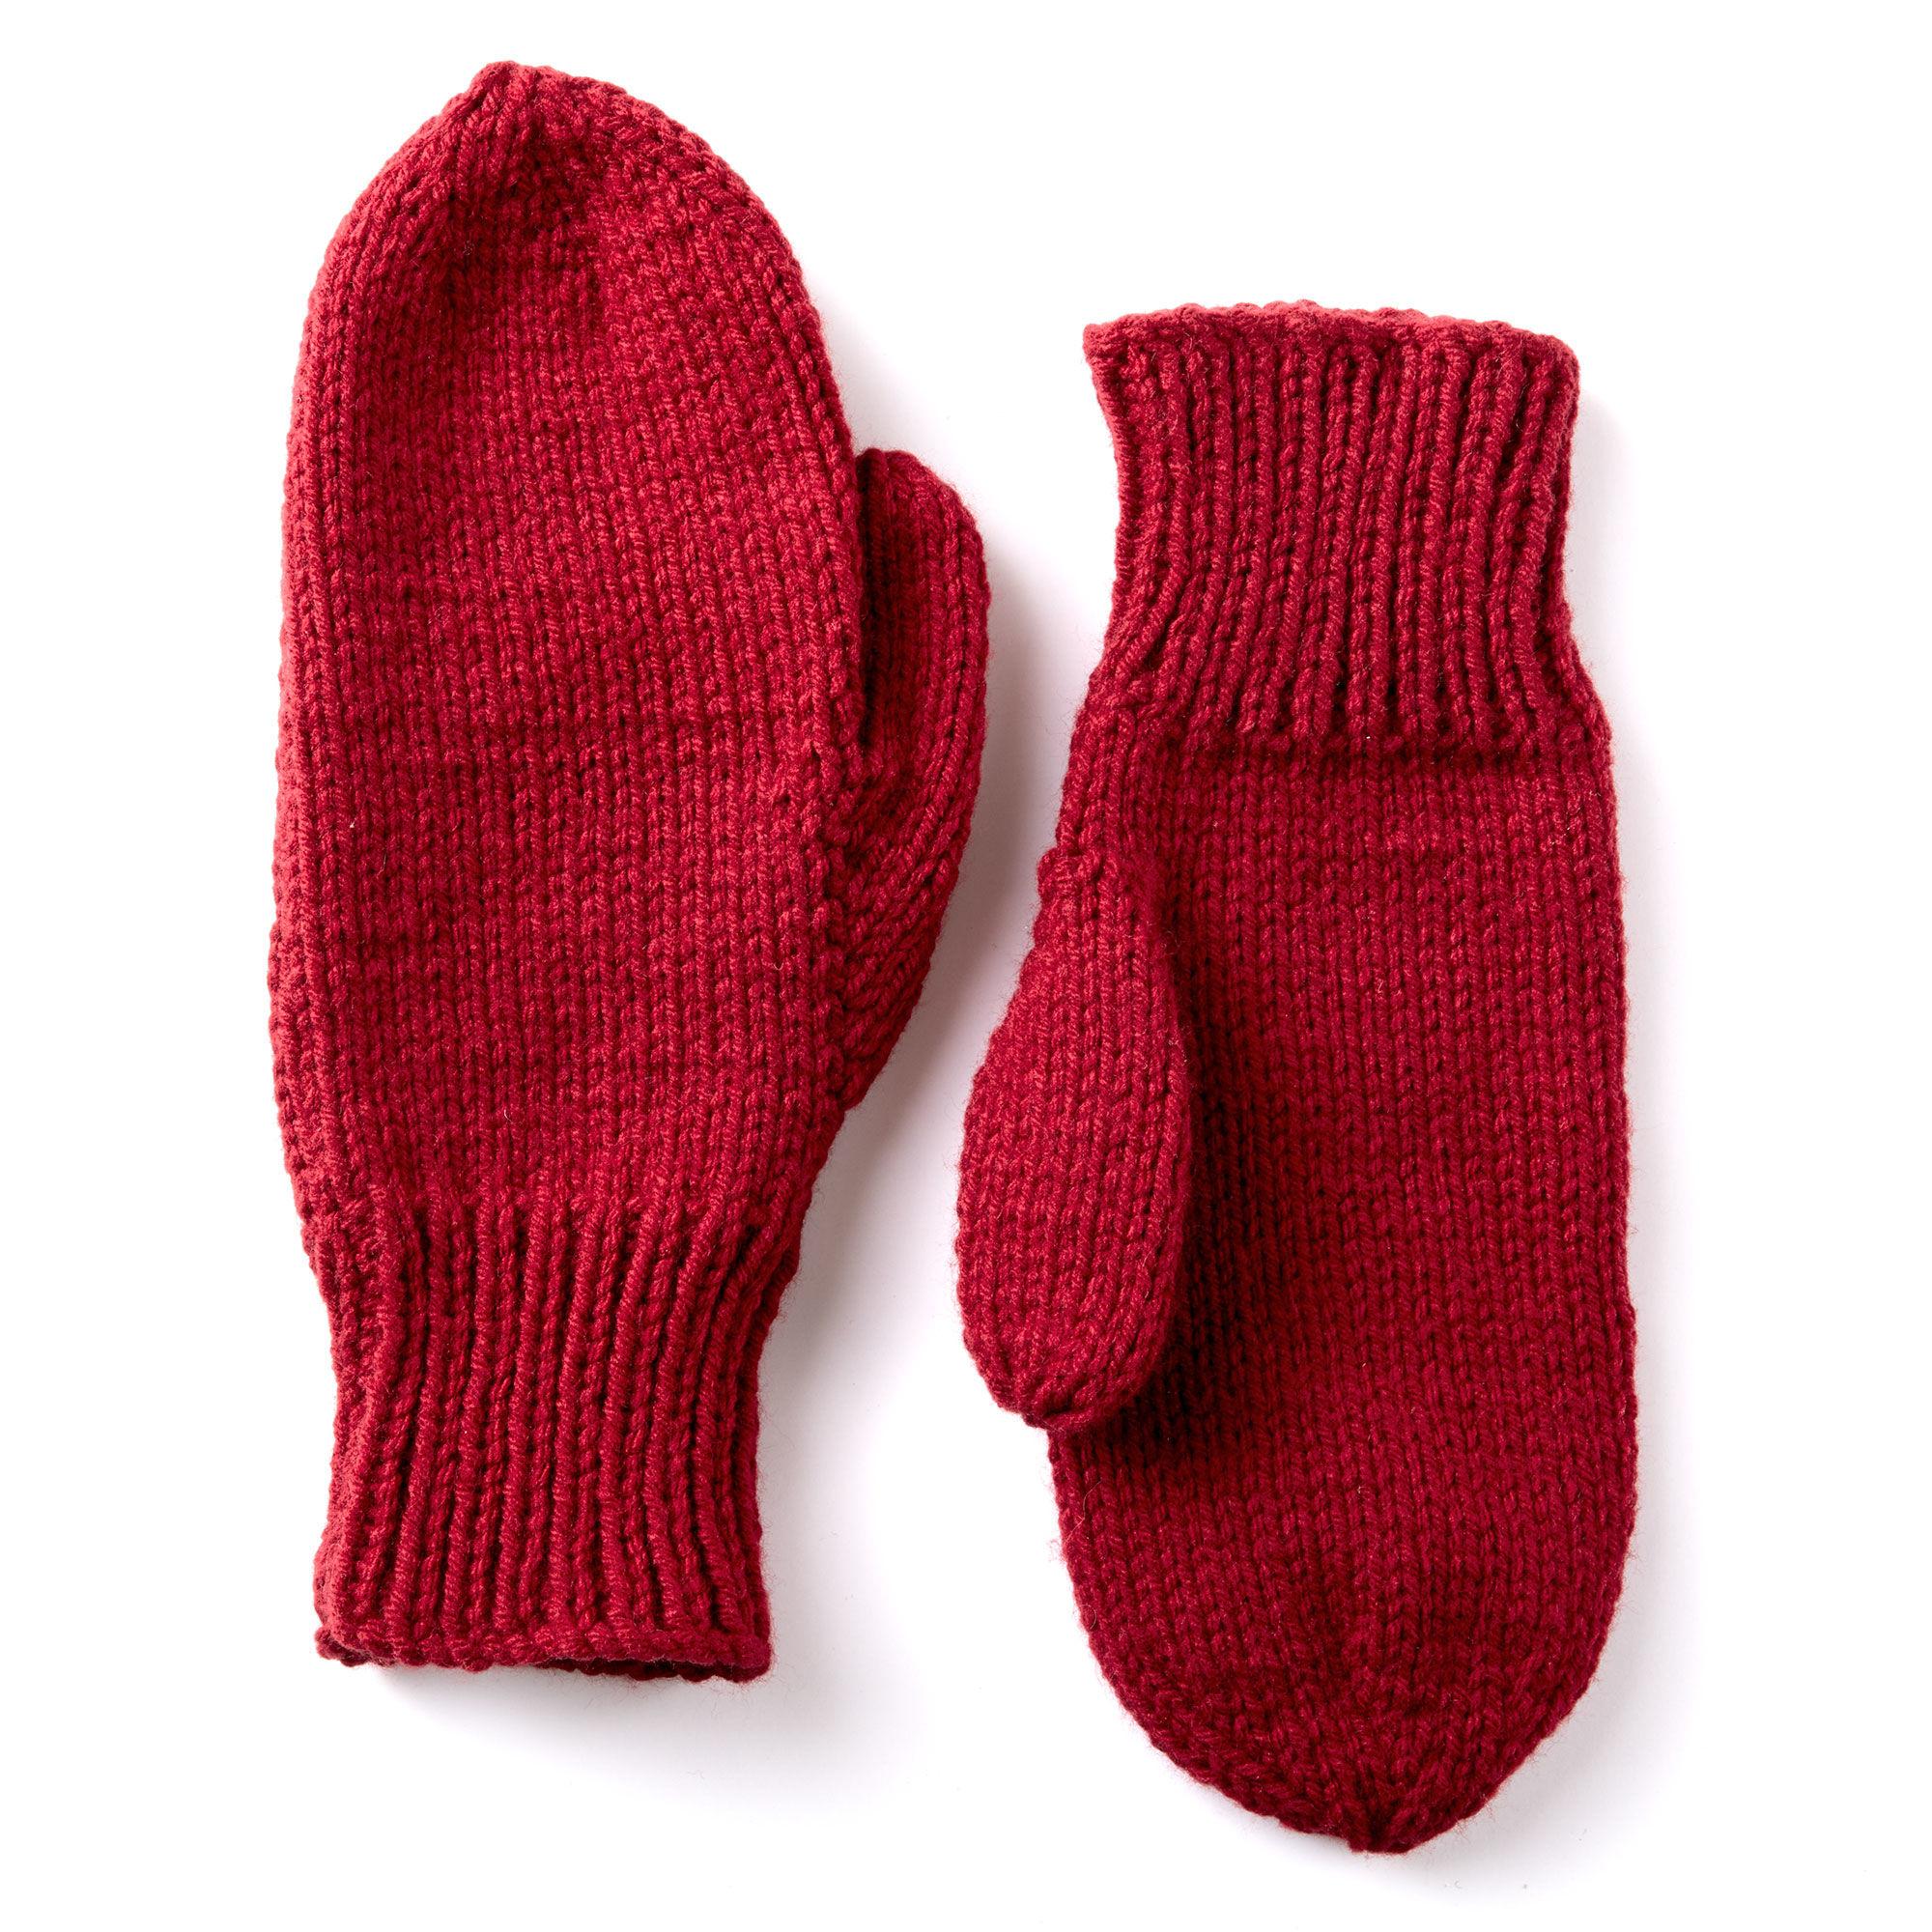 Knit Mittens for winter season